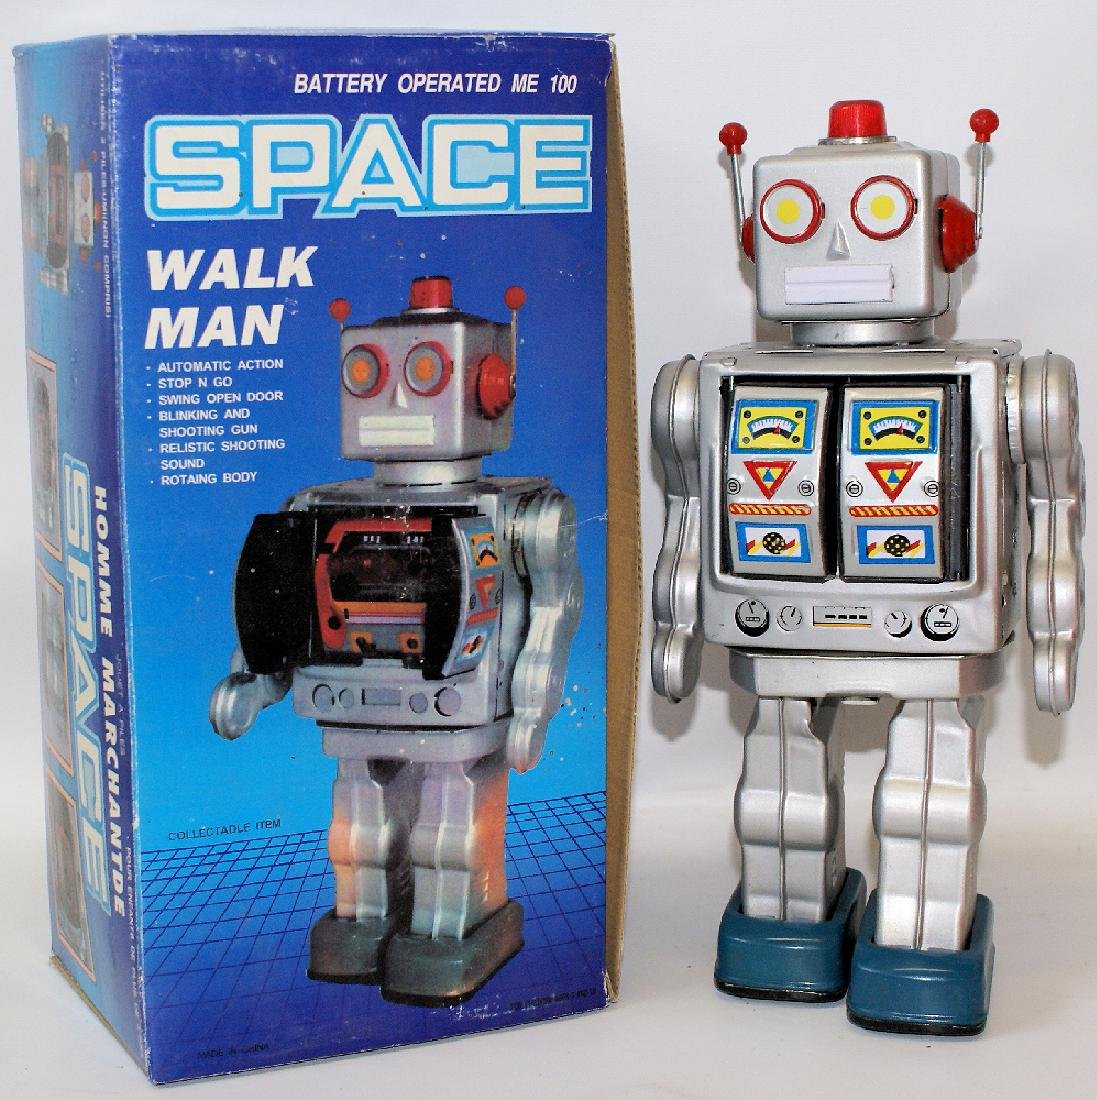 Vintage 1990's Tin Litho Silver SPACE 'WALK MAN' ROBOT